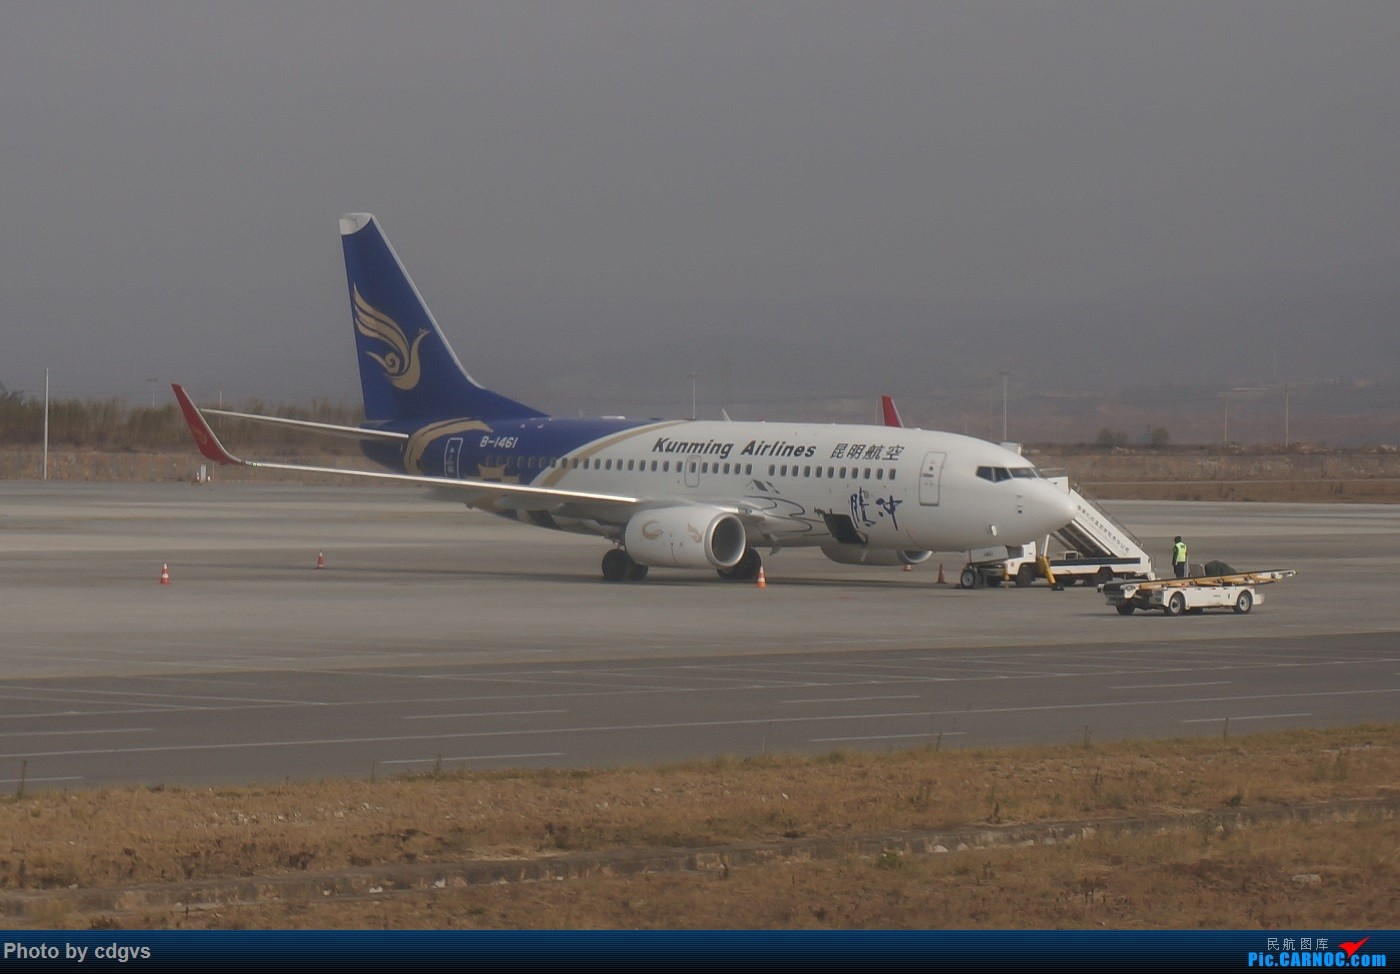 Re:[原创]KMG-LJG-KMG 东航&南航 省内刷航段,飞空客波音两种不同机型 BOEING 737-700 B-1461 中国昆明长水国际机场